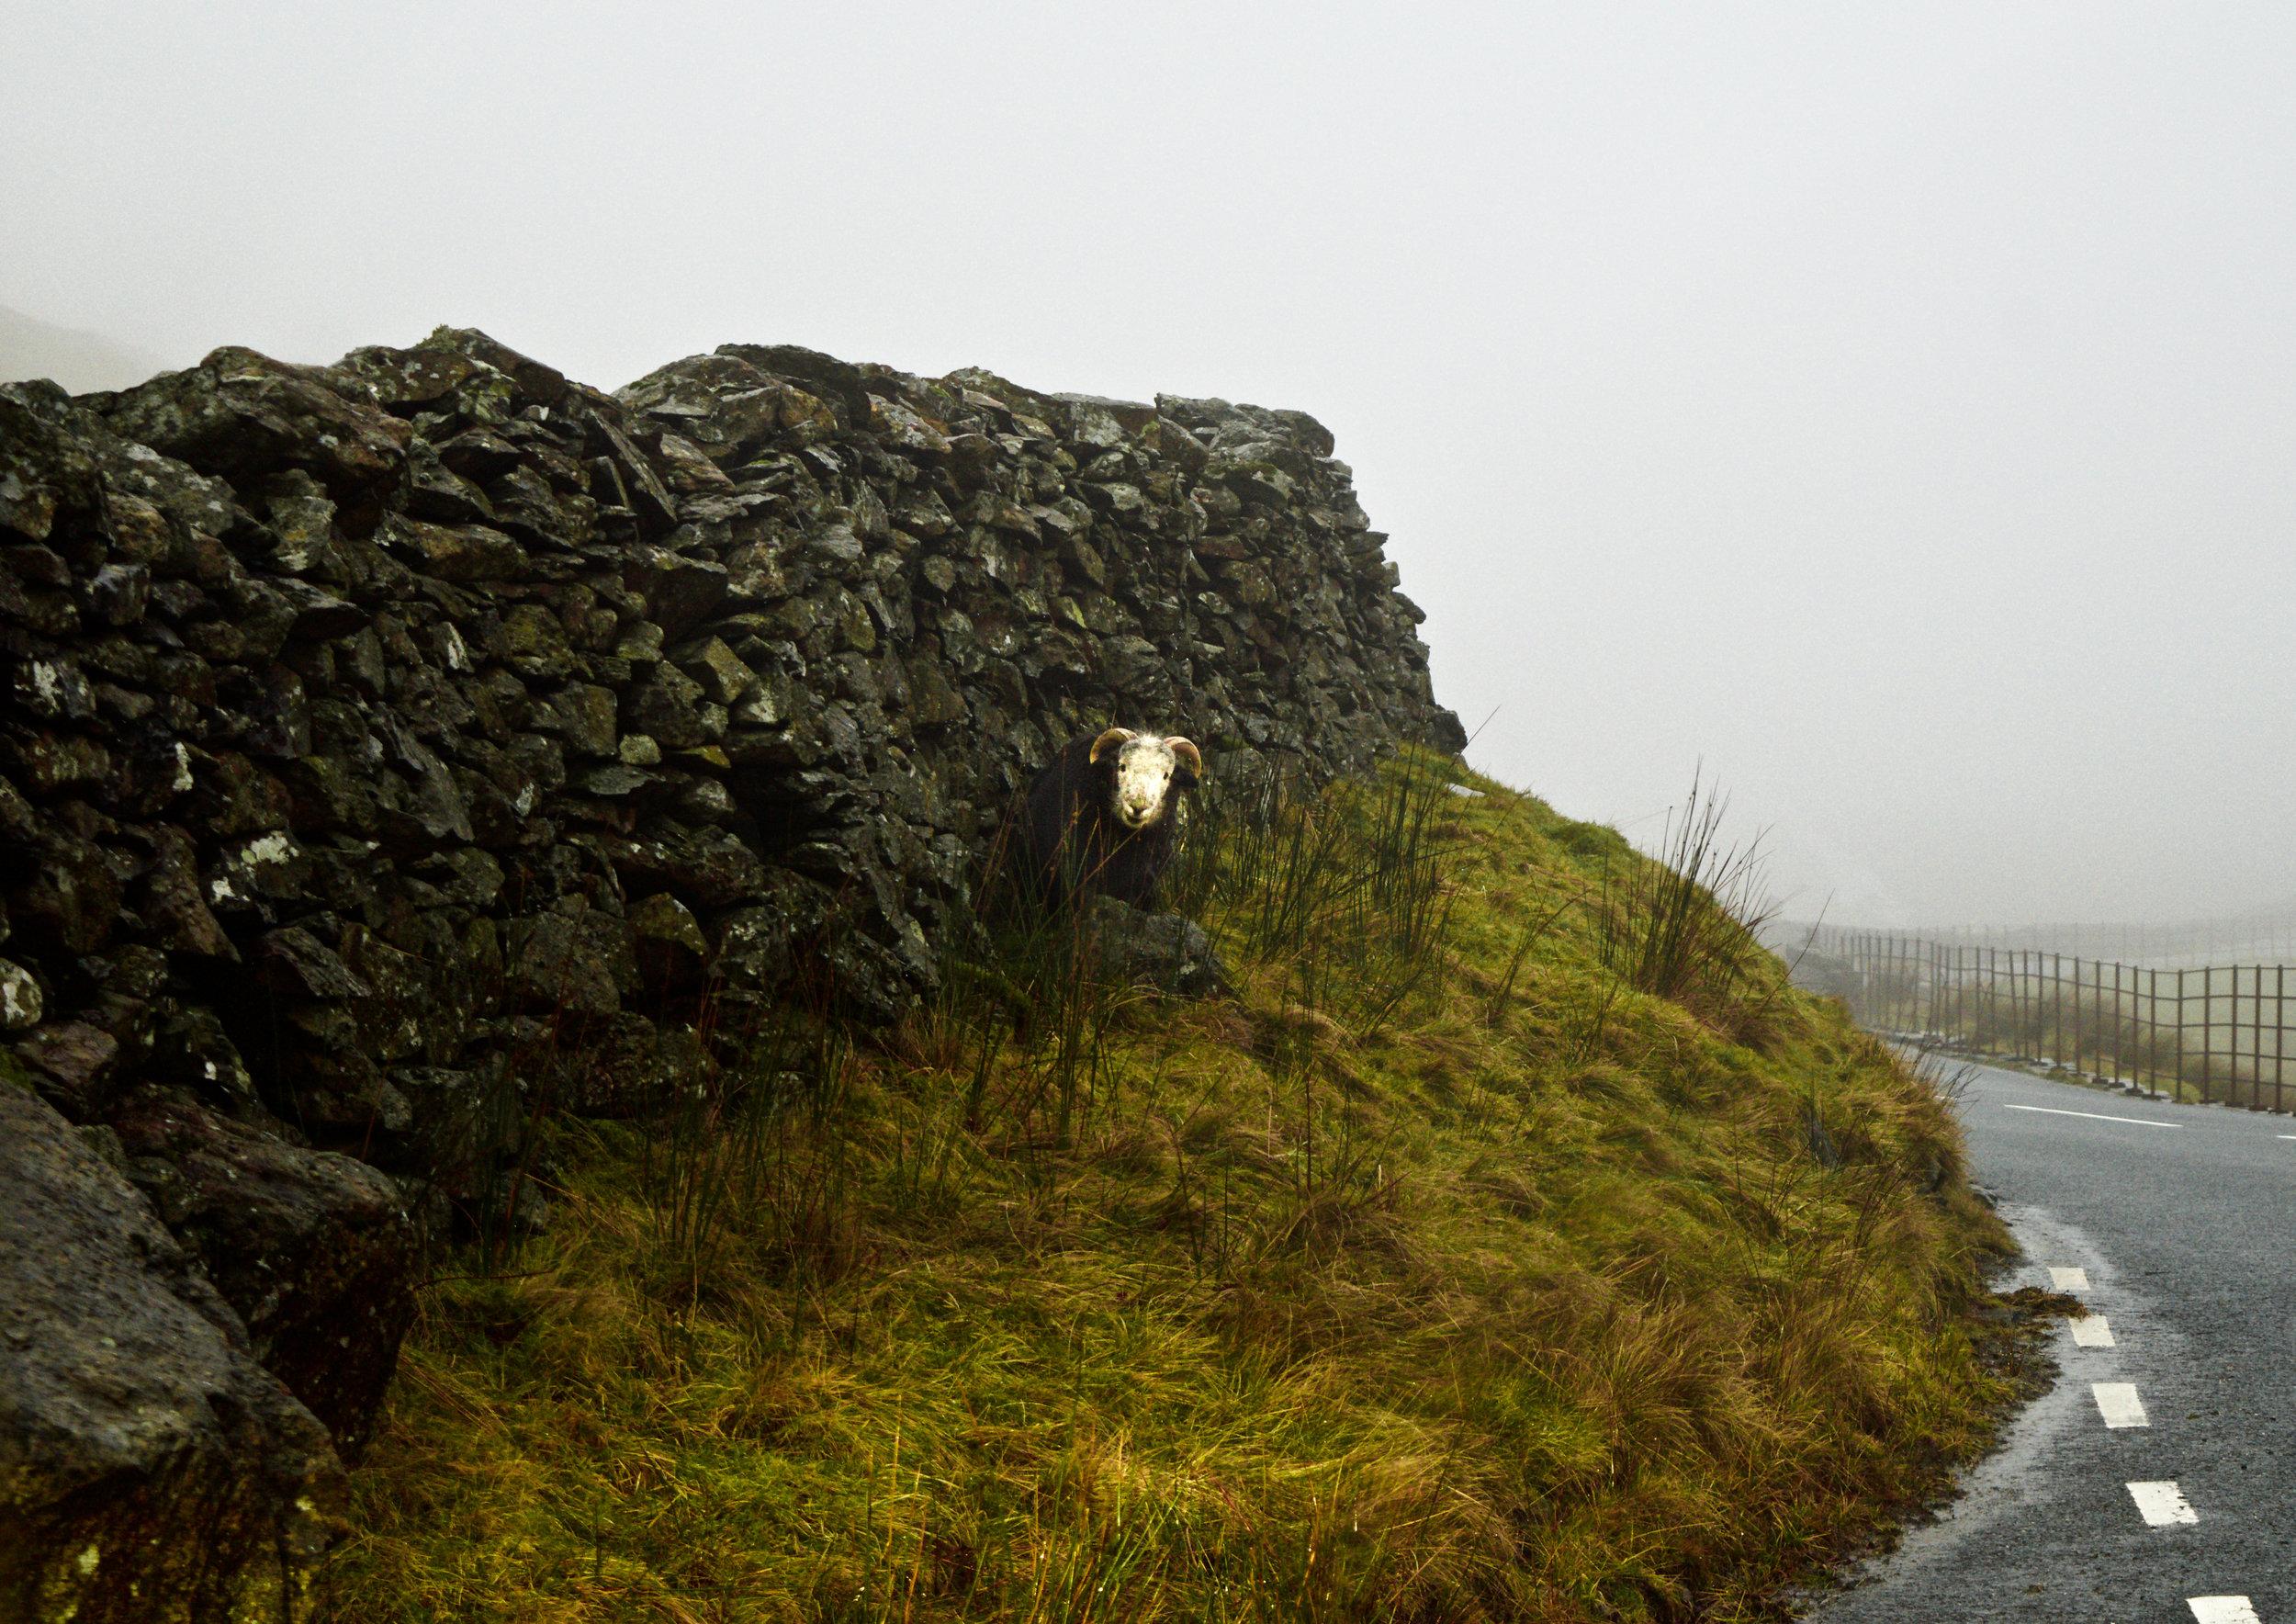 SHEEP ON KIRKSTONE PASS